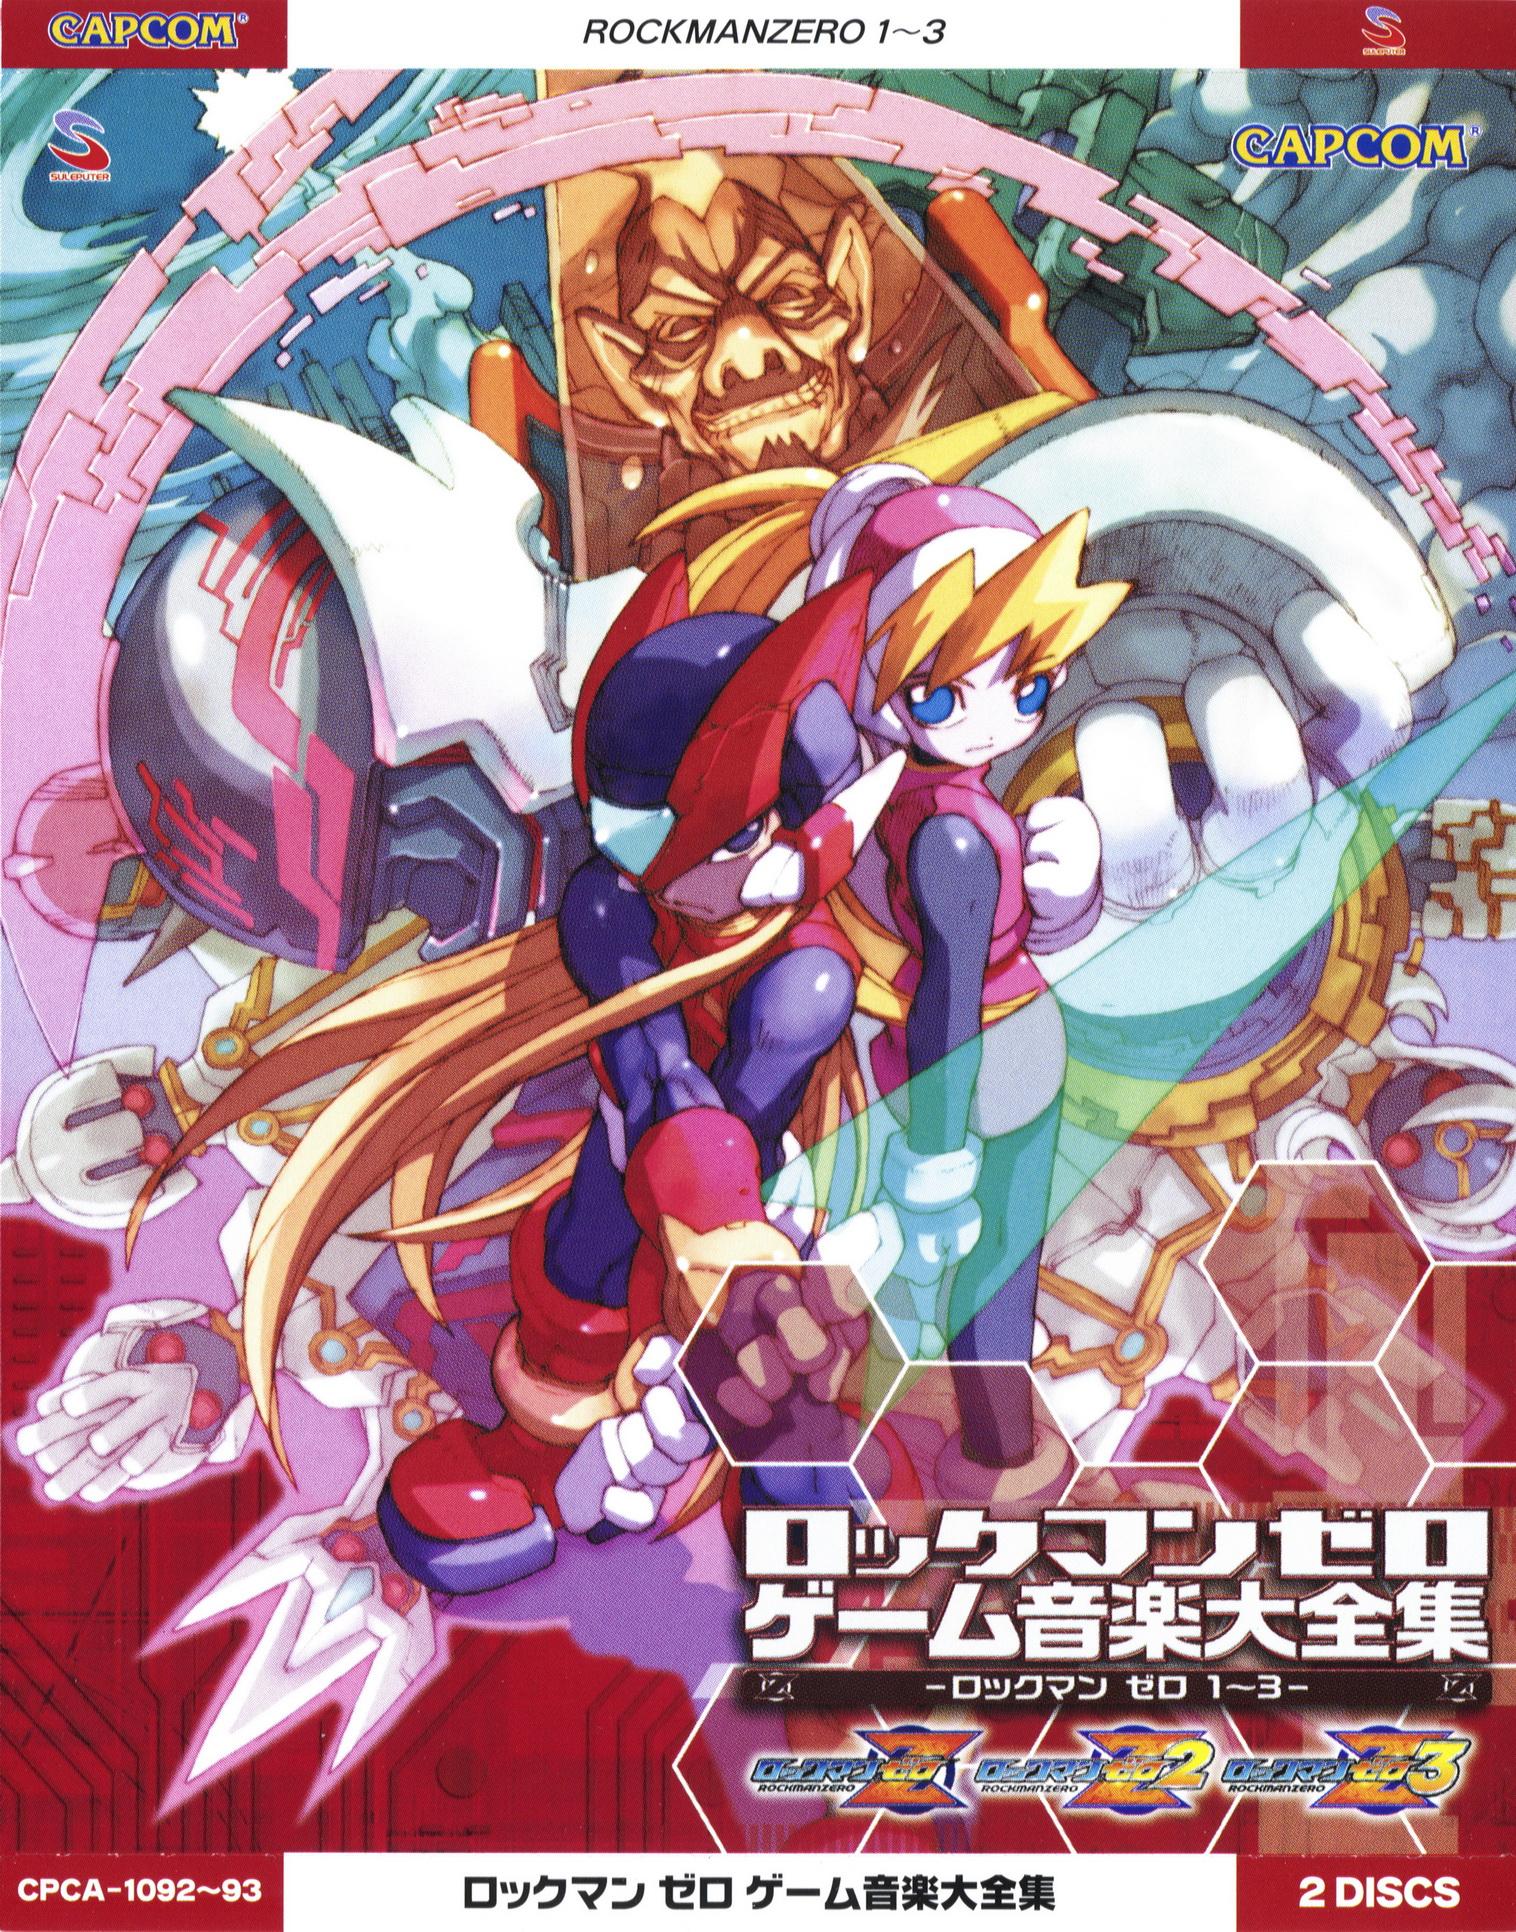 Rockman zero game ongaku dai zenshuu rockman zero 1 3 - Megaman wikia ...